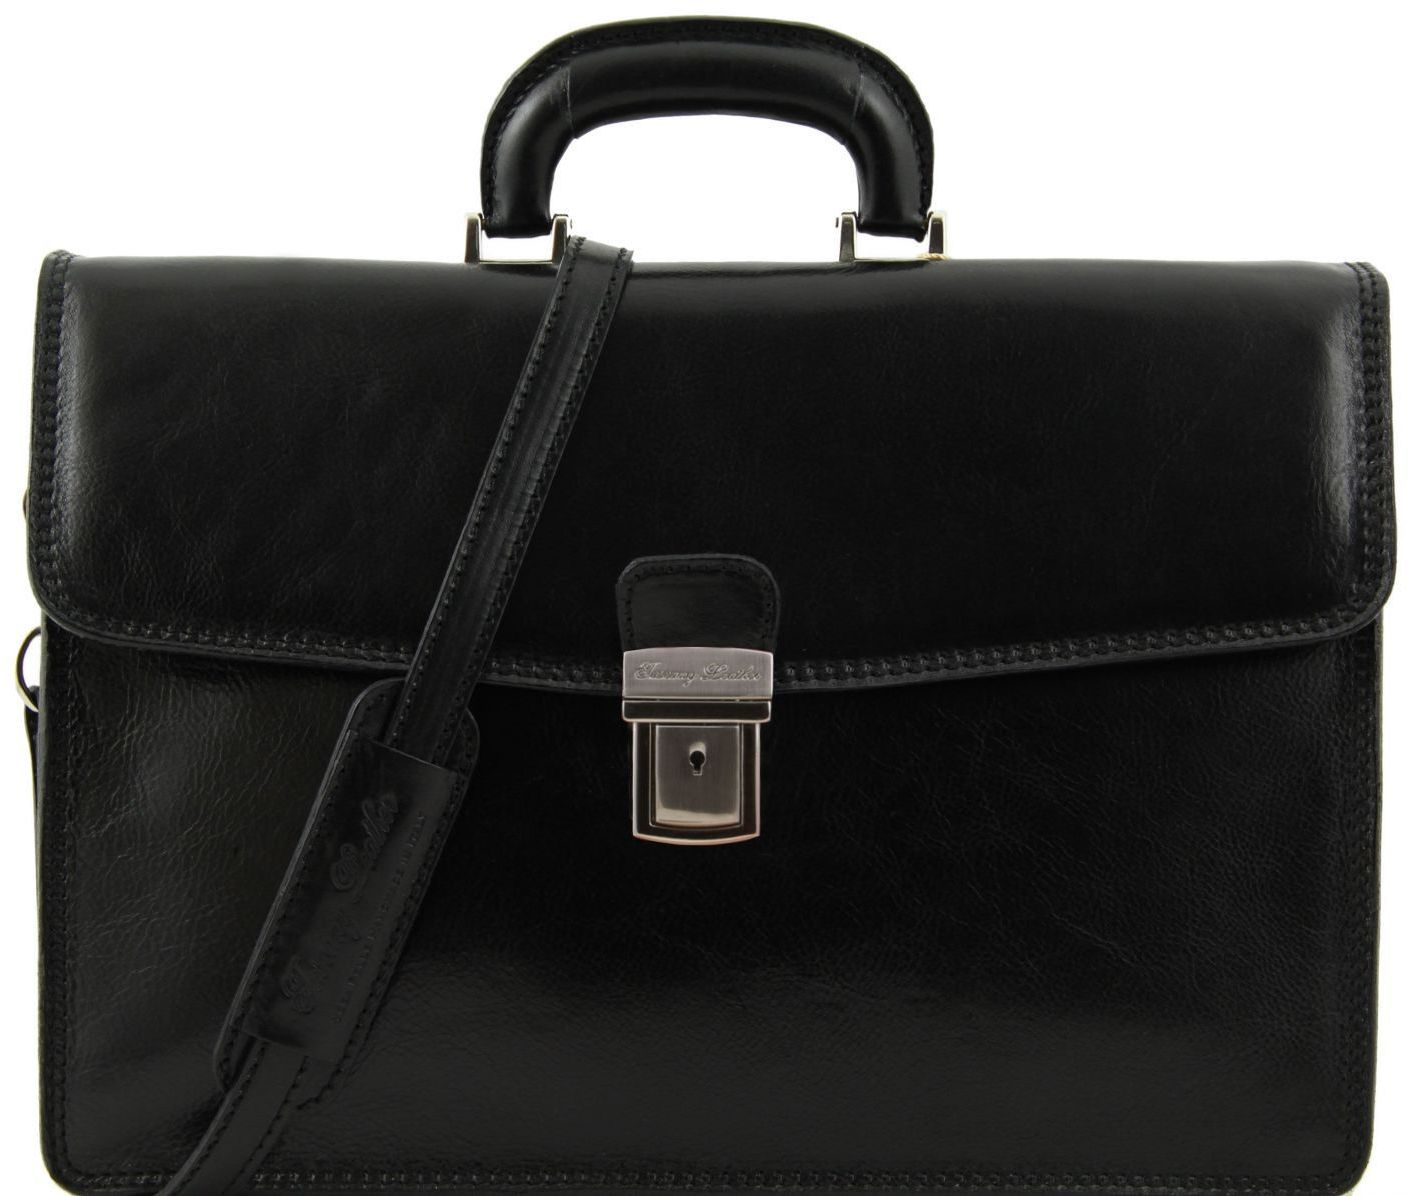 f1abc26caa Ανδρική Επαγγελματική Τσάντα Δερμάτινη Amalfi Μαύρο Tuscany Leather